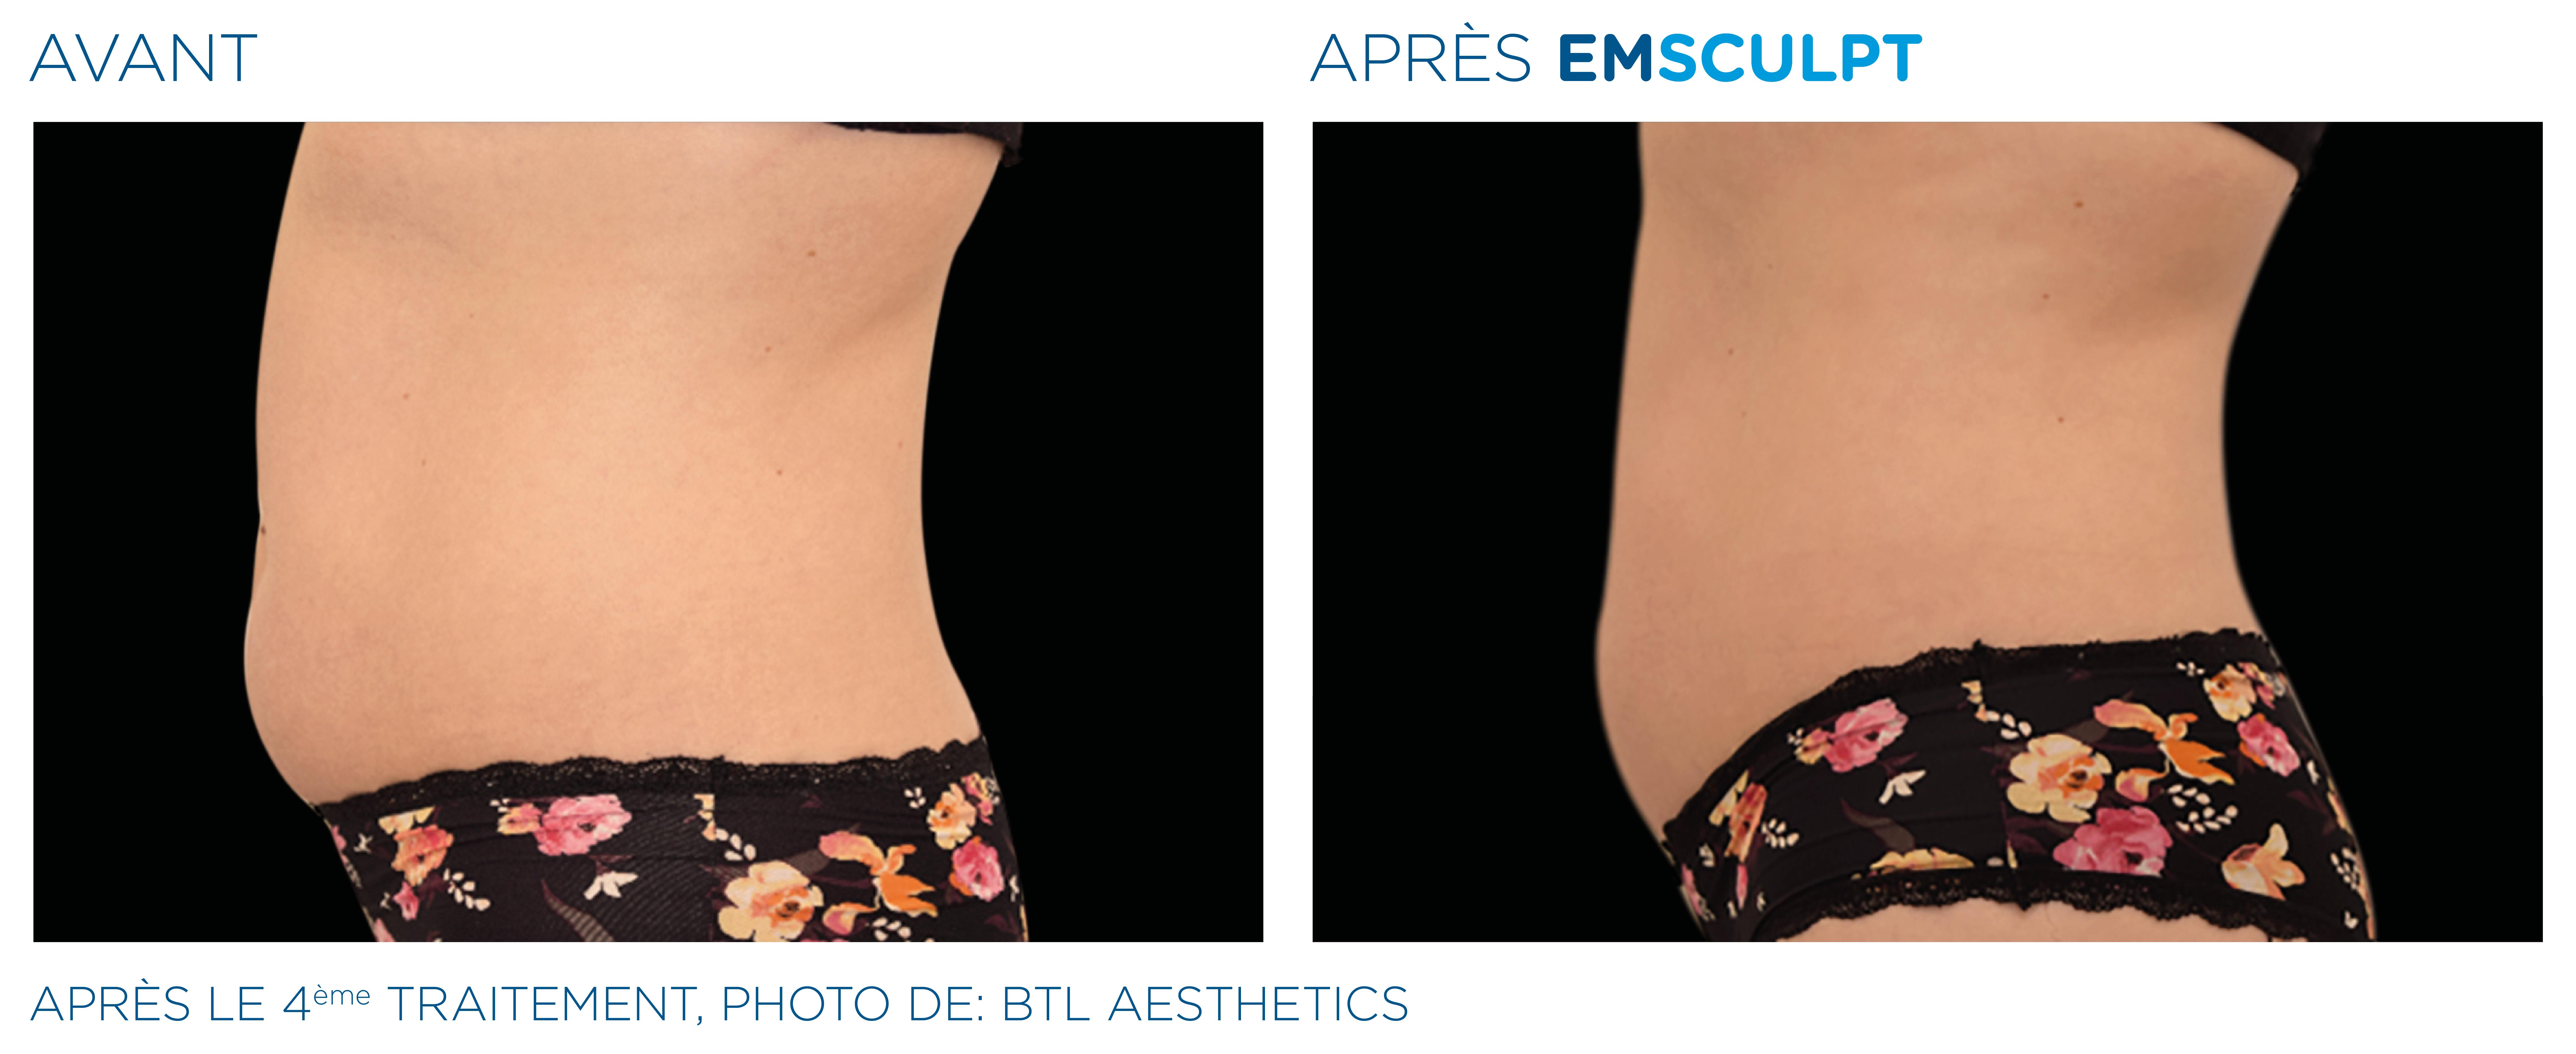 Emsculpt_PIC_Ba-card-female-abdomen-025_FR100